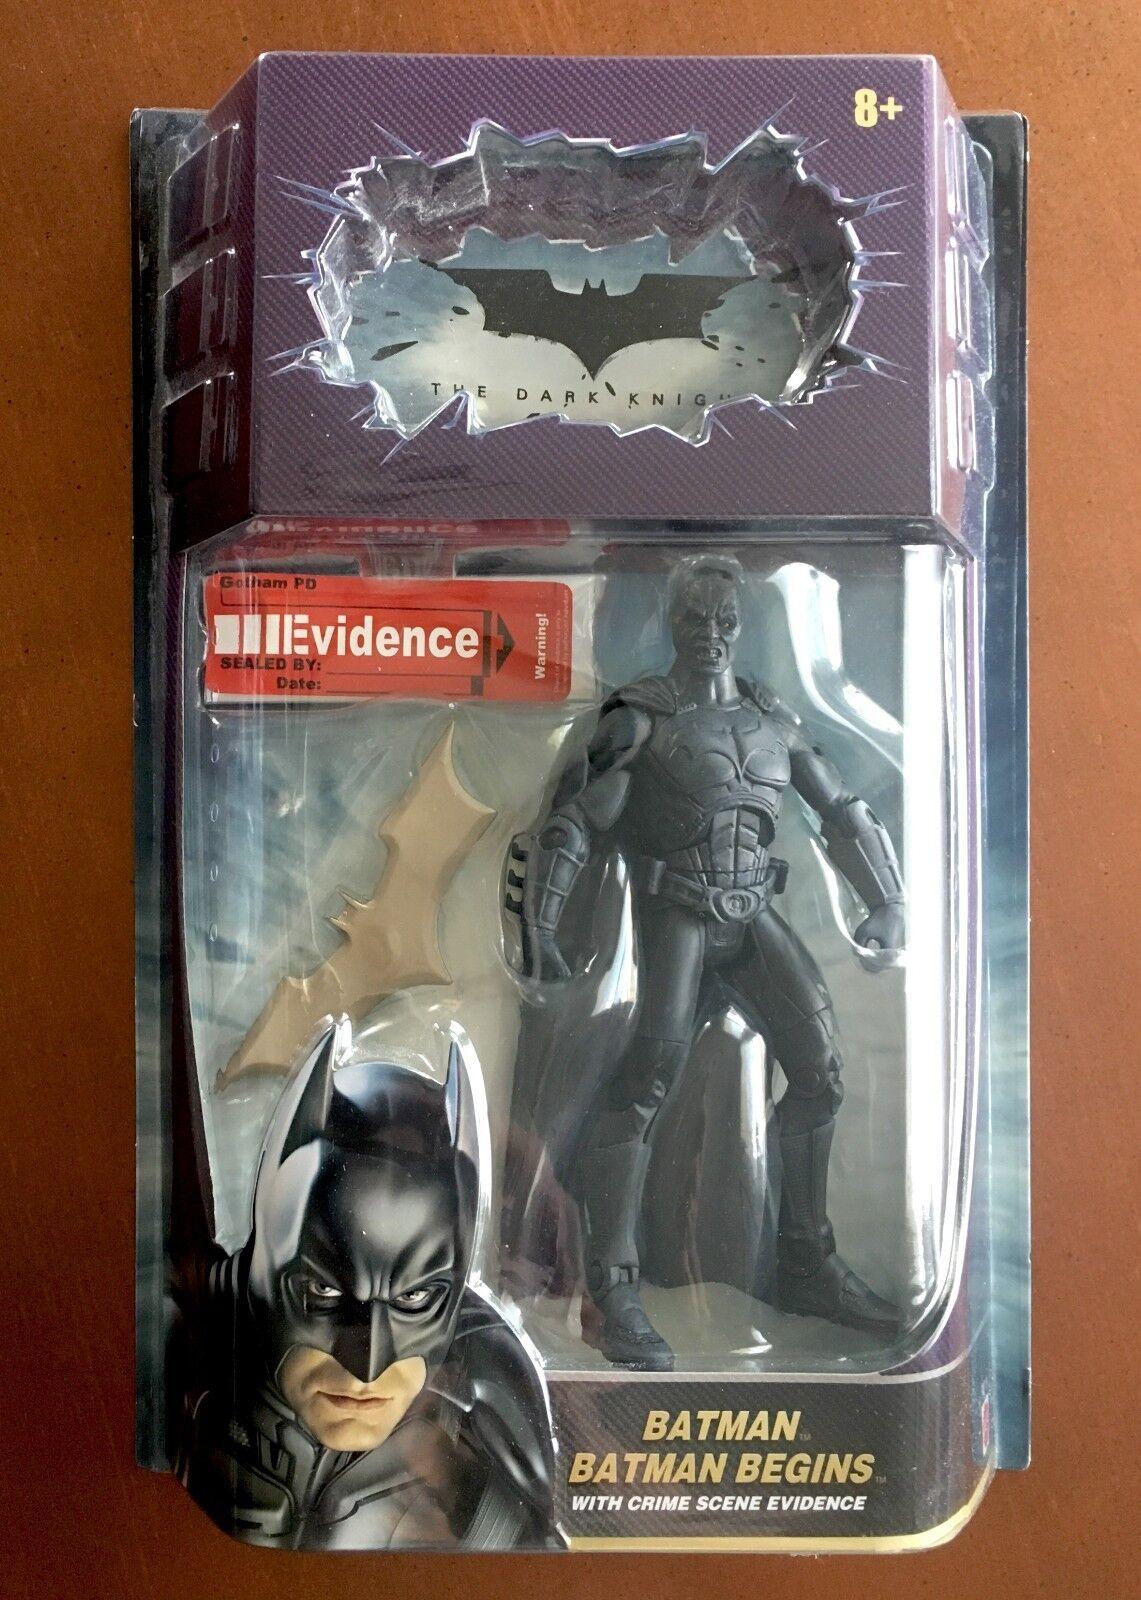 Batman begins batman - figur - variante - dc - universum film